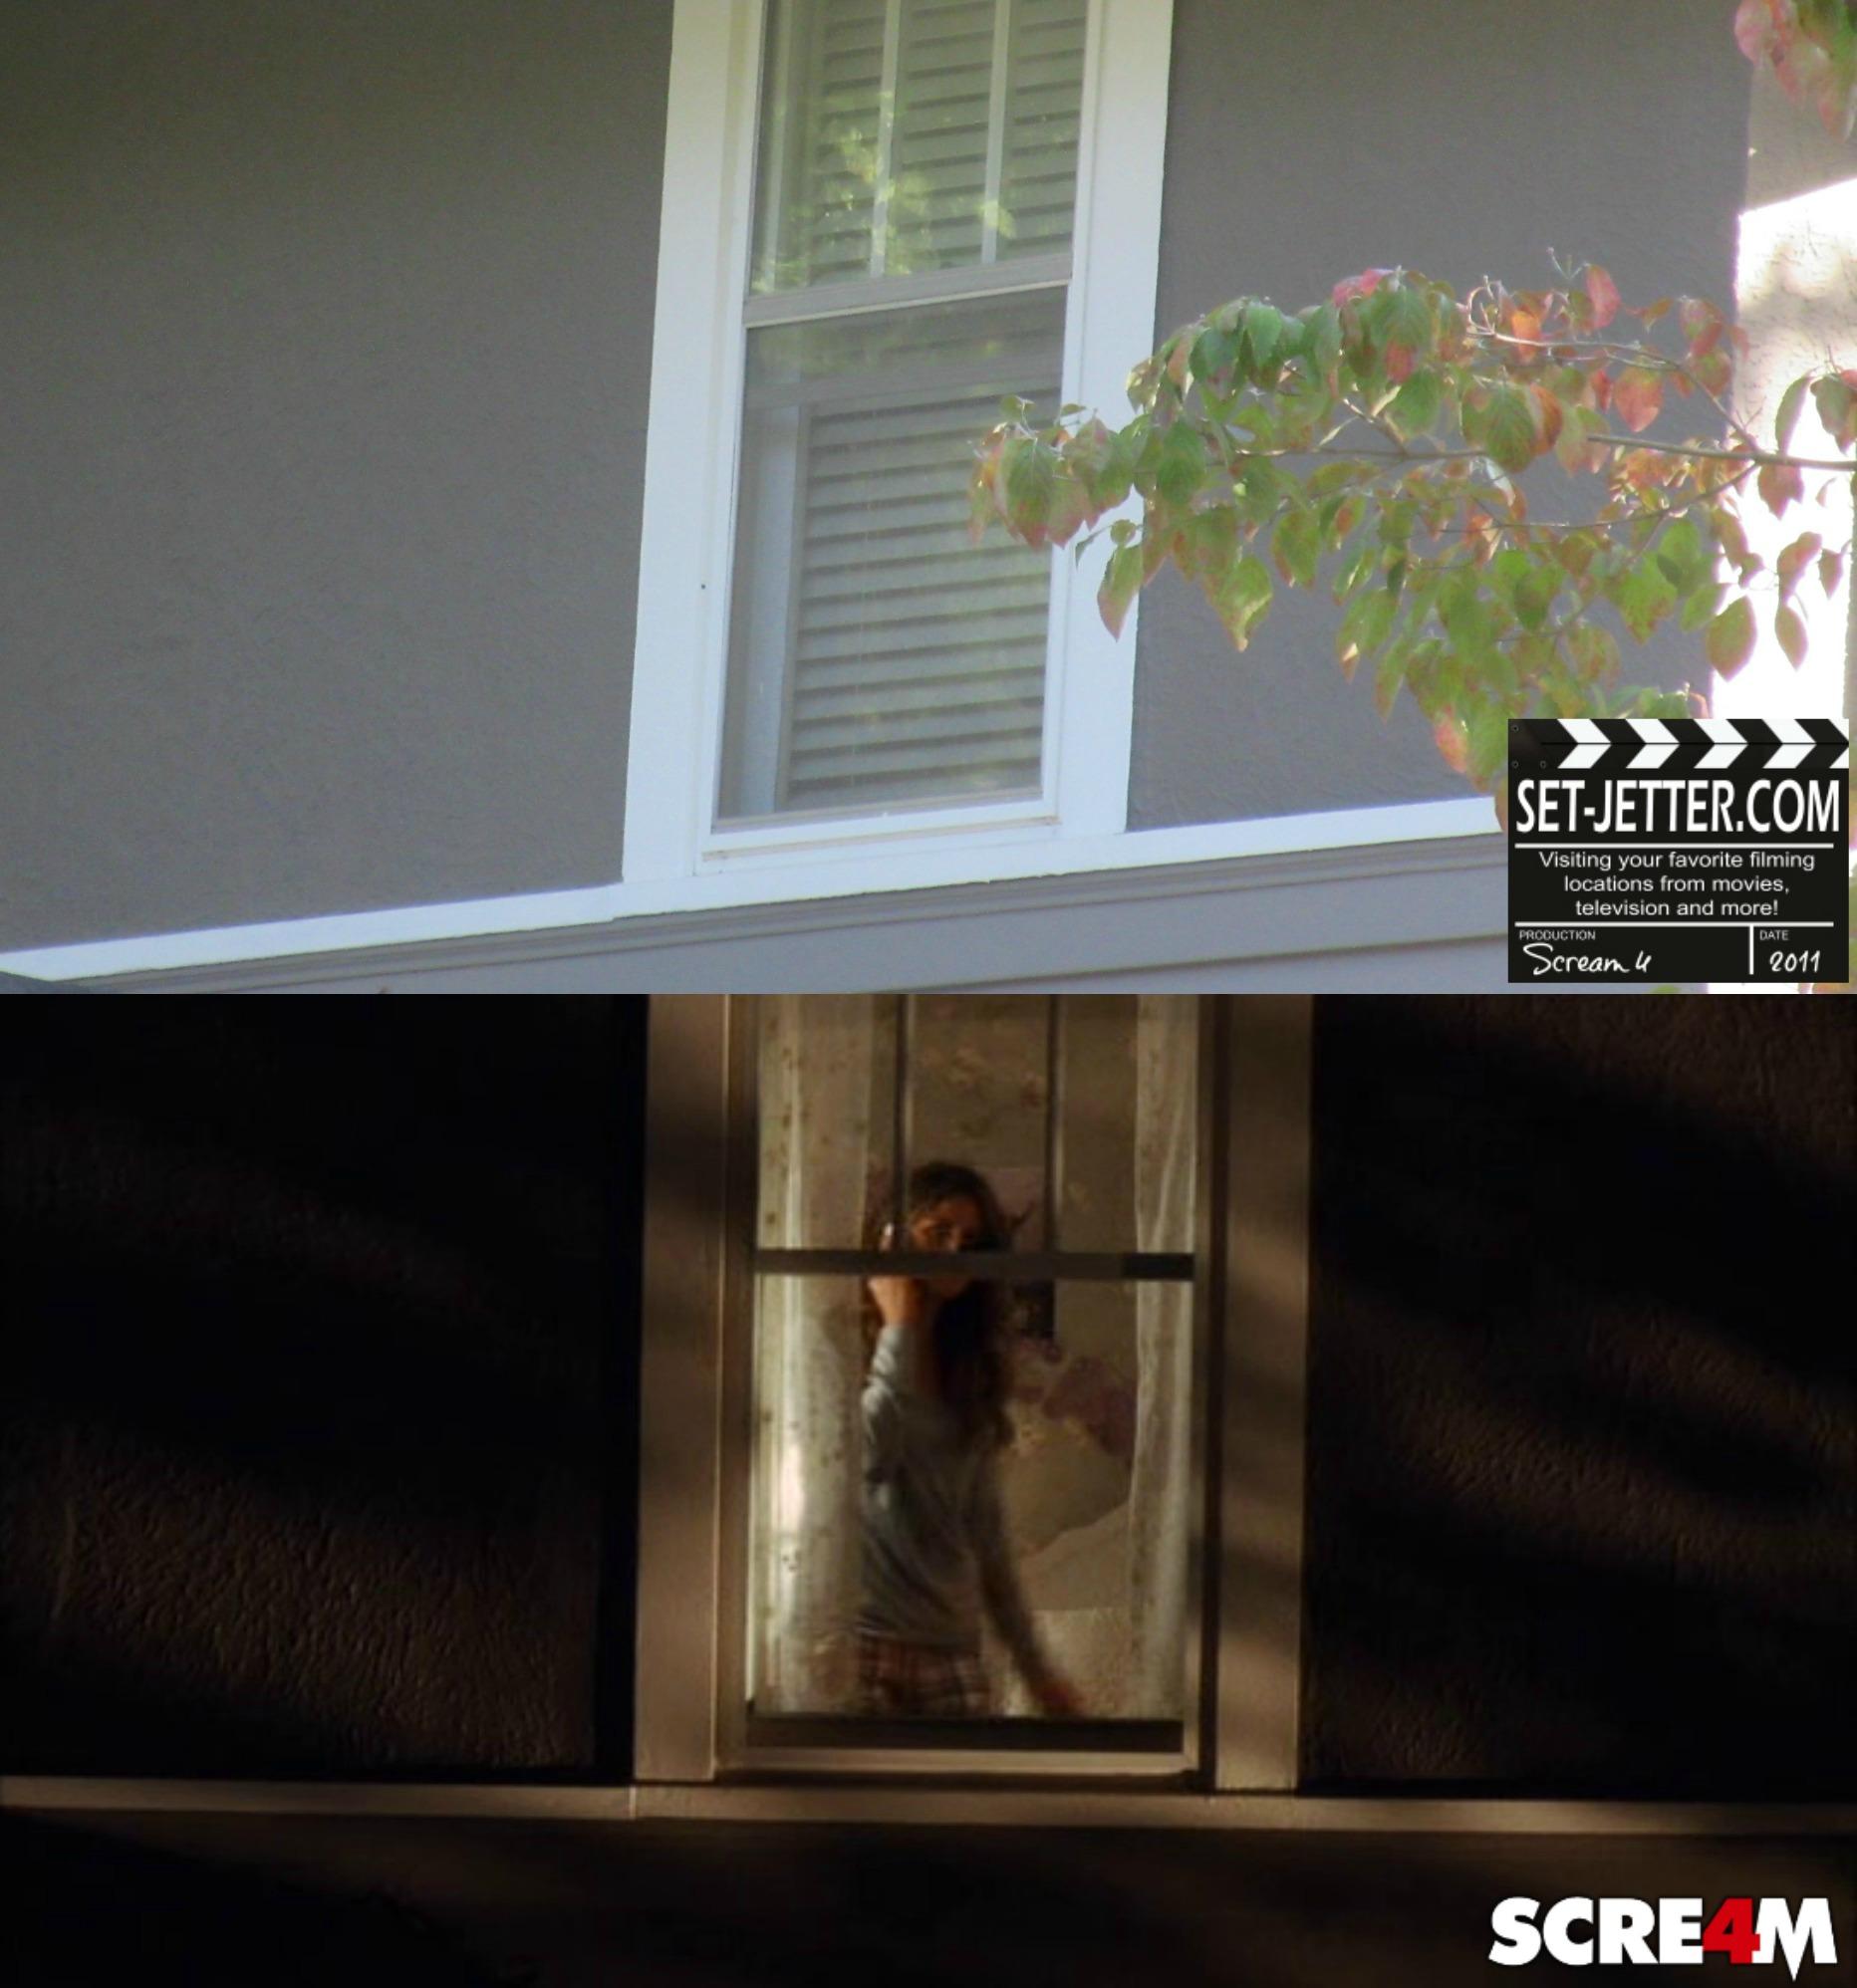 Scream4 comparison 110.jpg